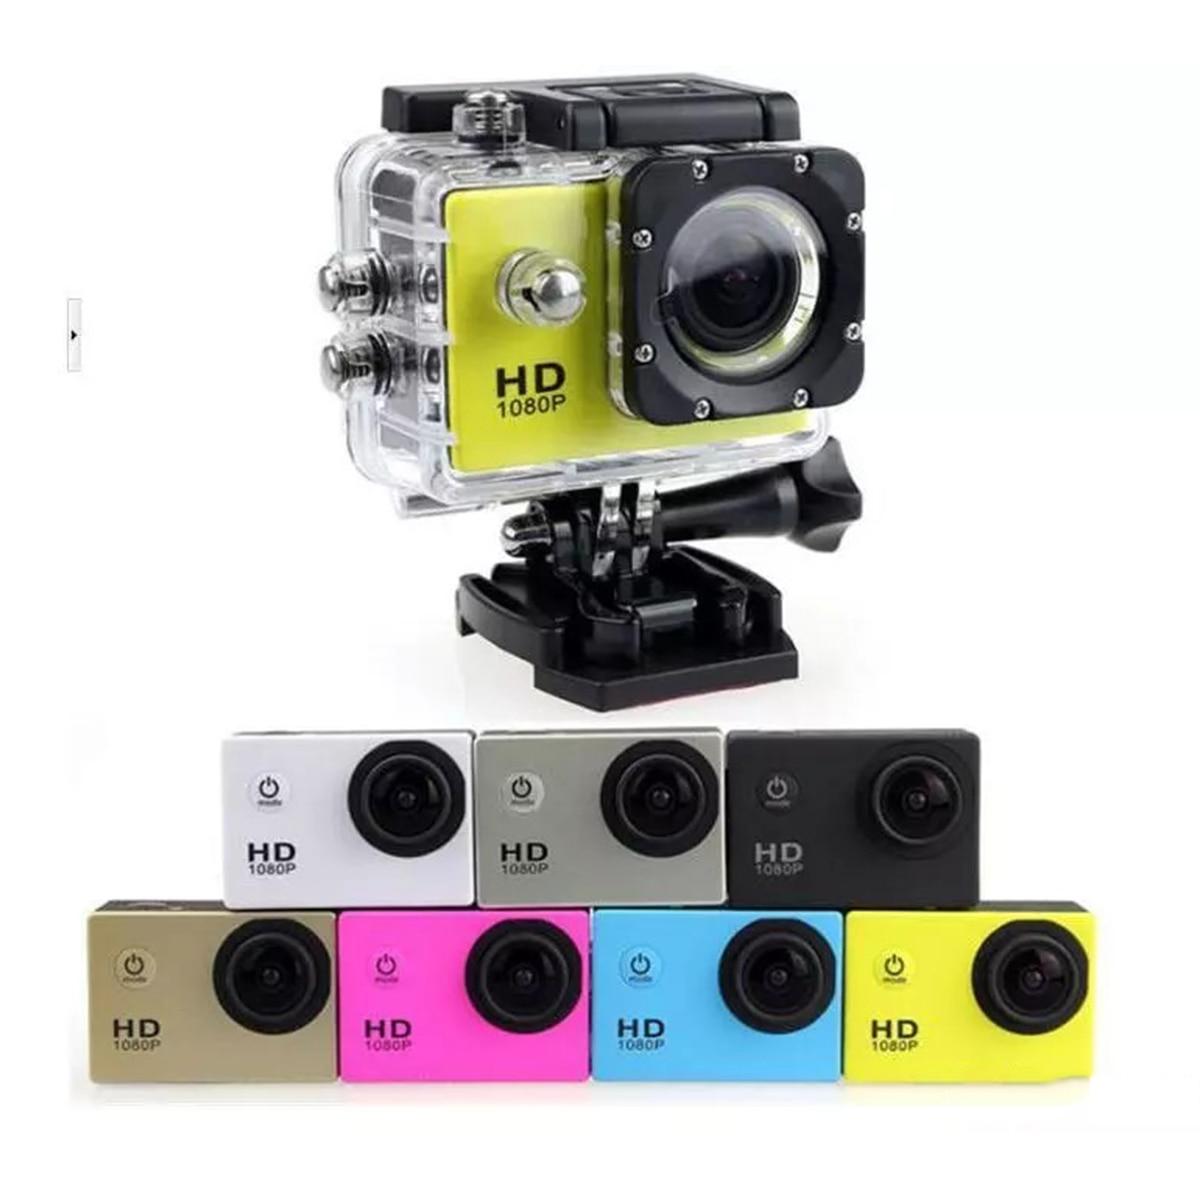 SJ4000 Action Camera Diving 30M Waterproof 1080P Full HD Go Underwater Helmet Sport Camera Sport DV 12MP Photo Pixel Camera